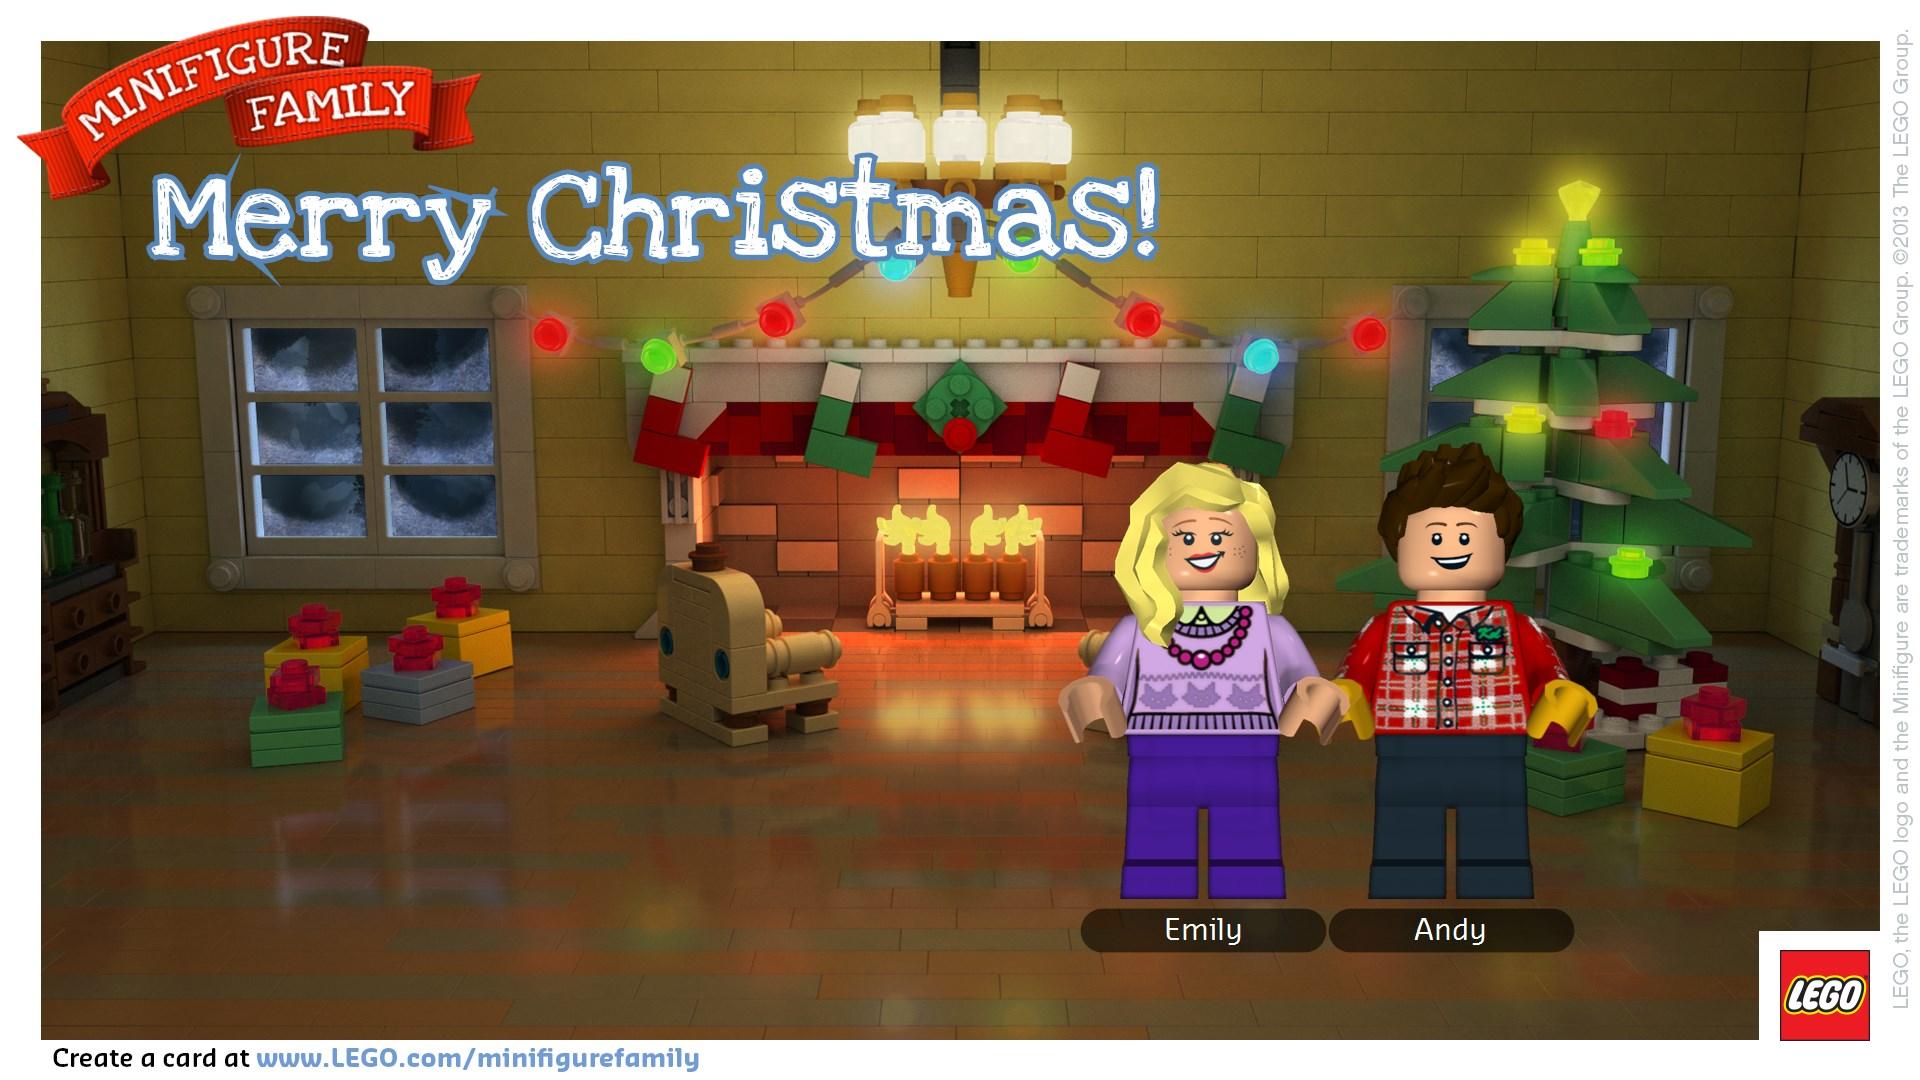 Fun Holiday Minifigure LEGO Card at thebensonstreet.com